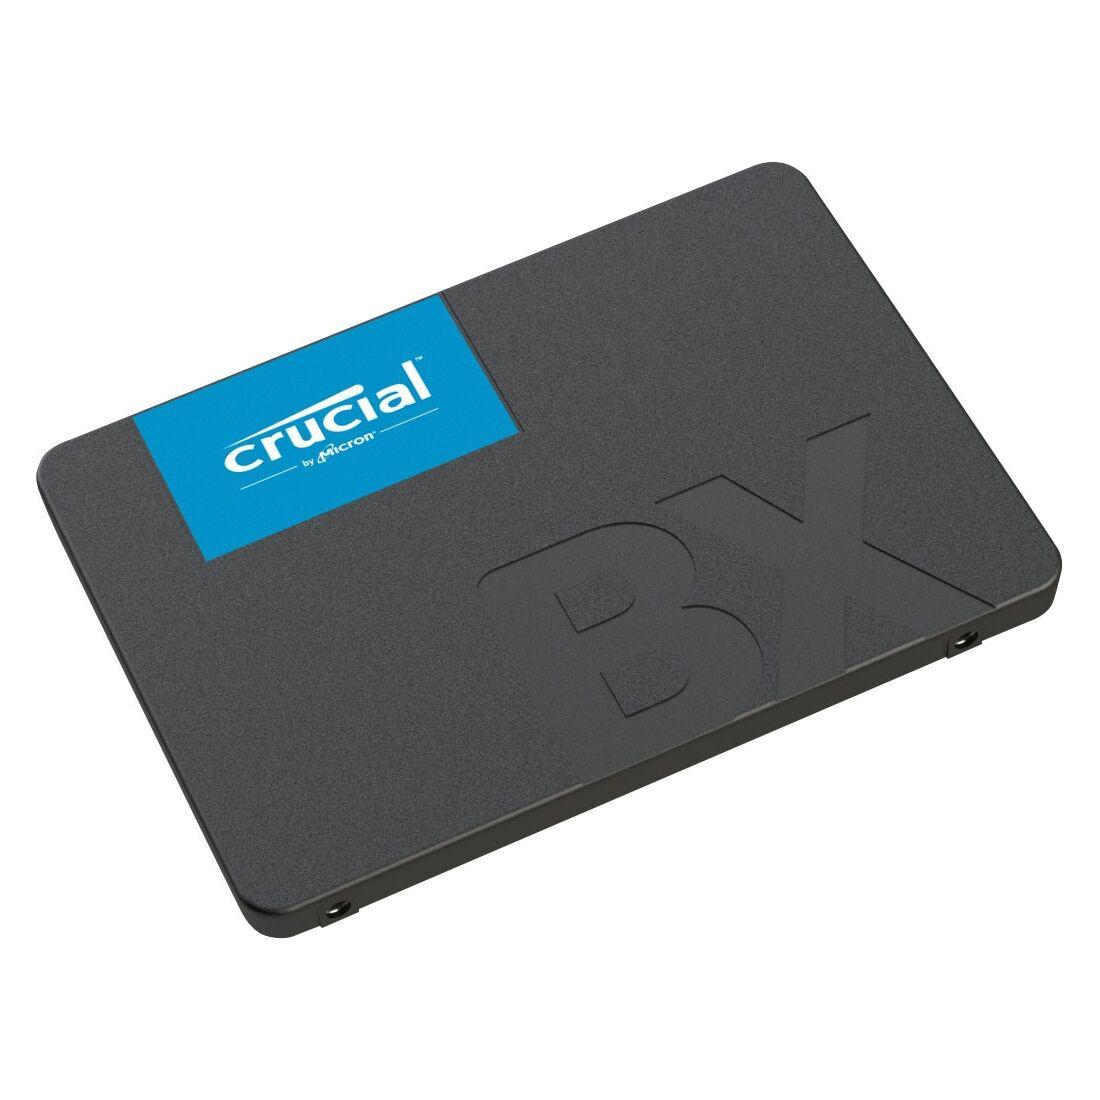 Crucial_BX500_Dynamic-Right